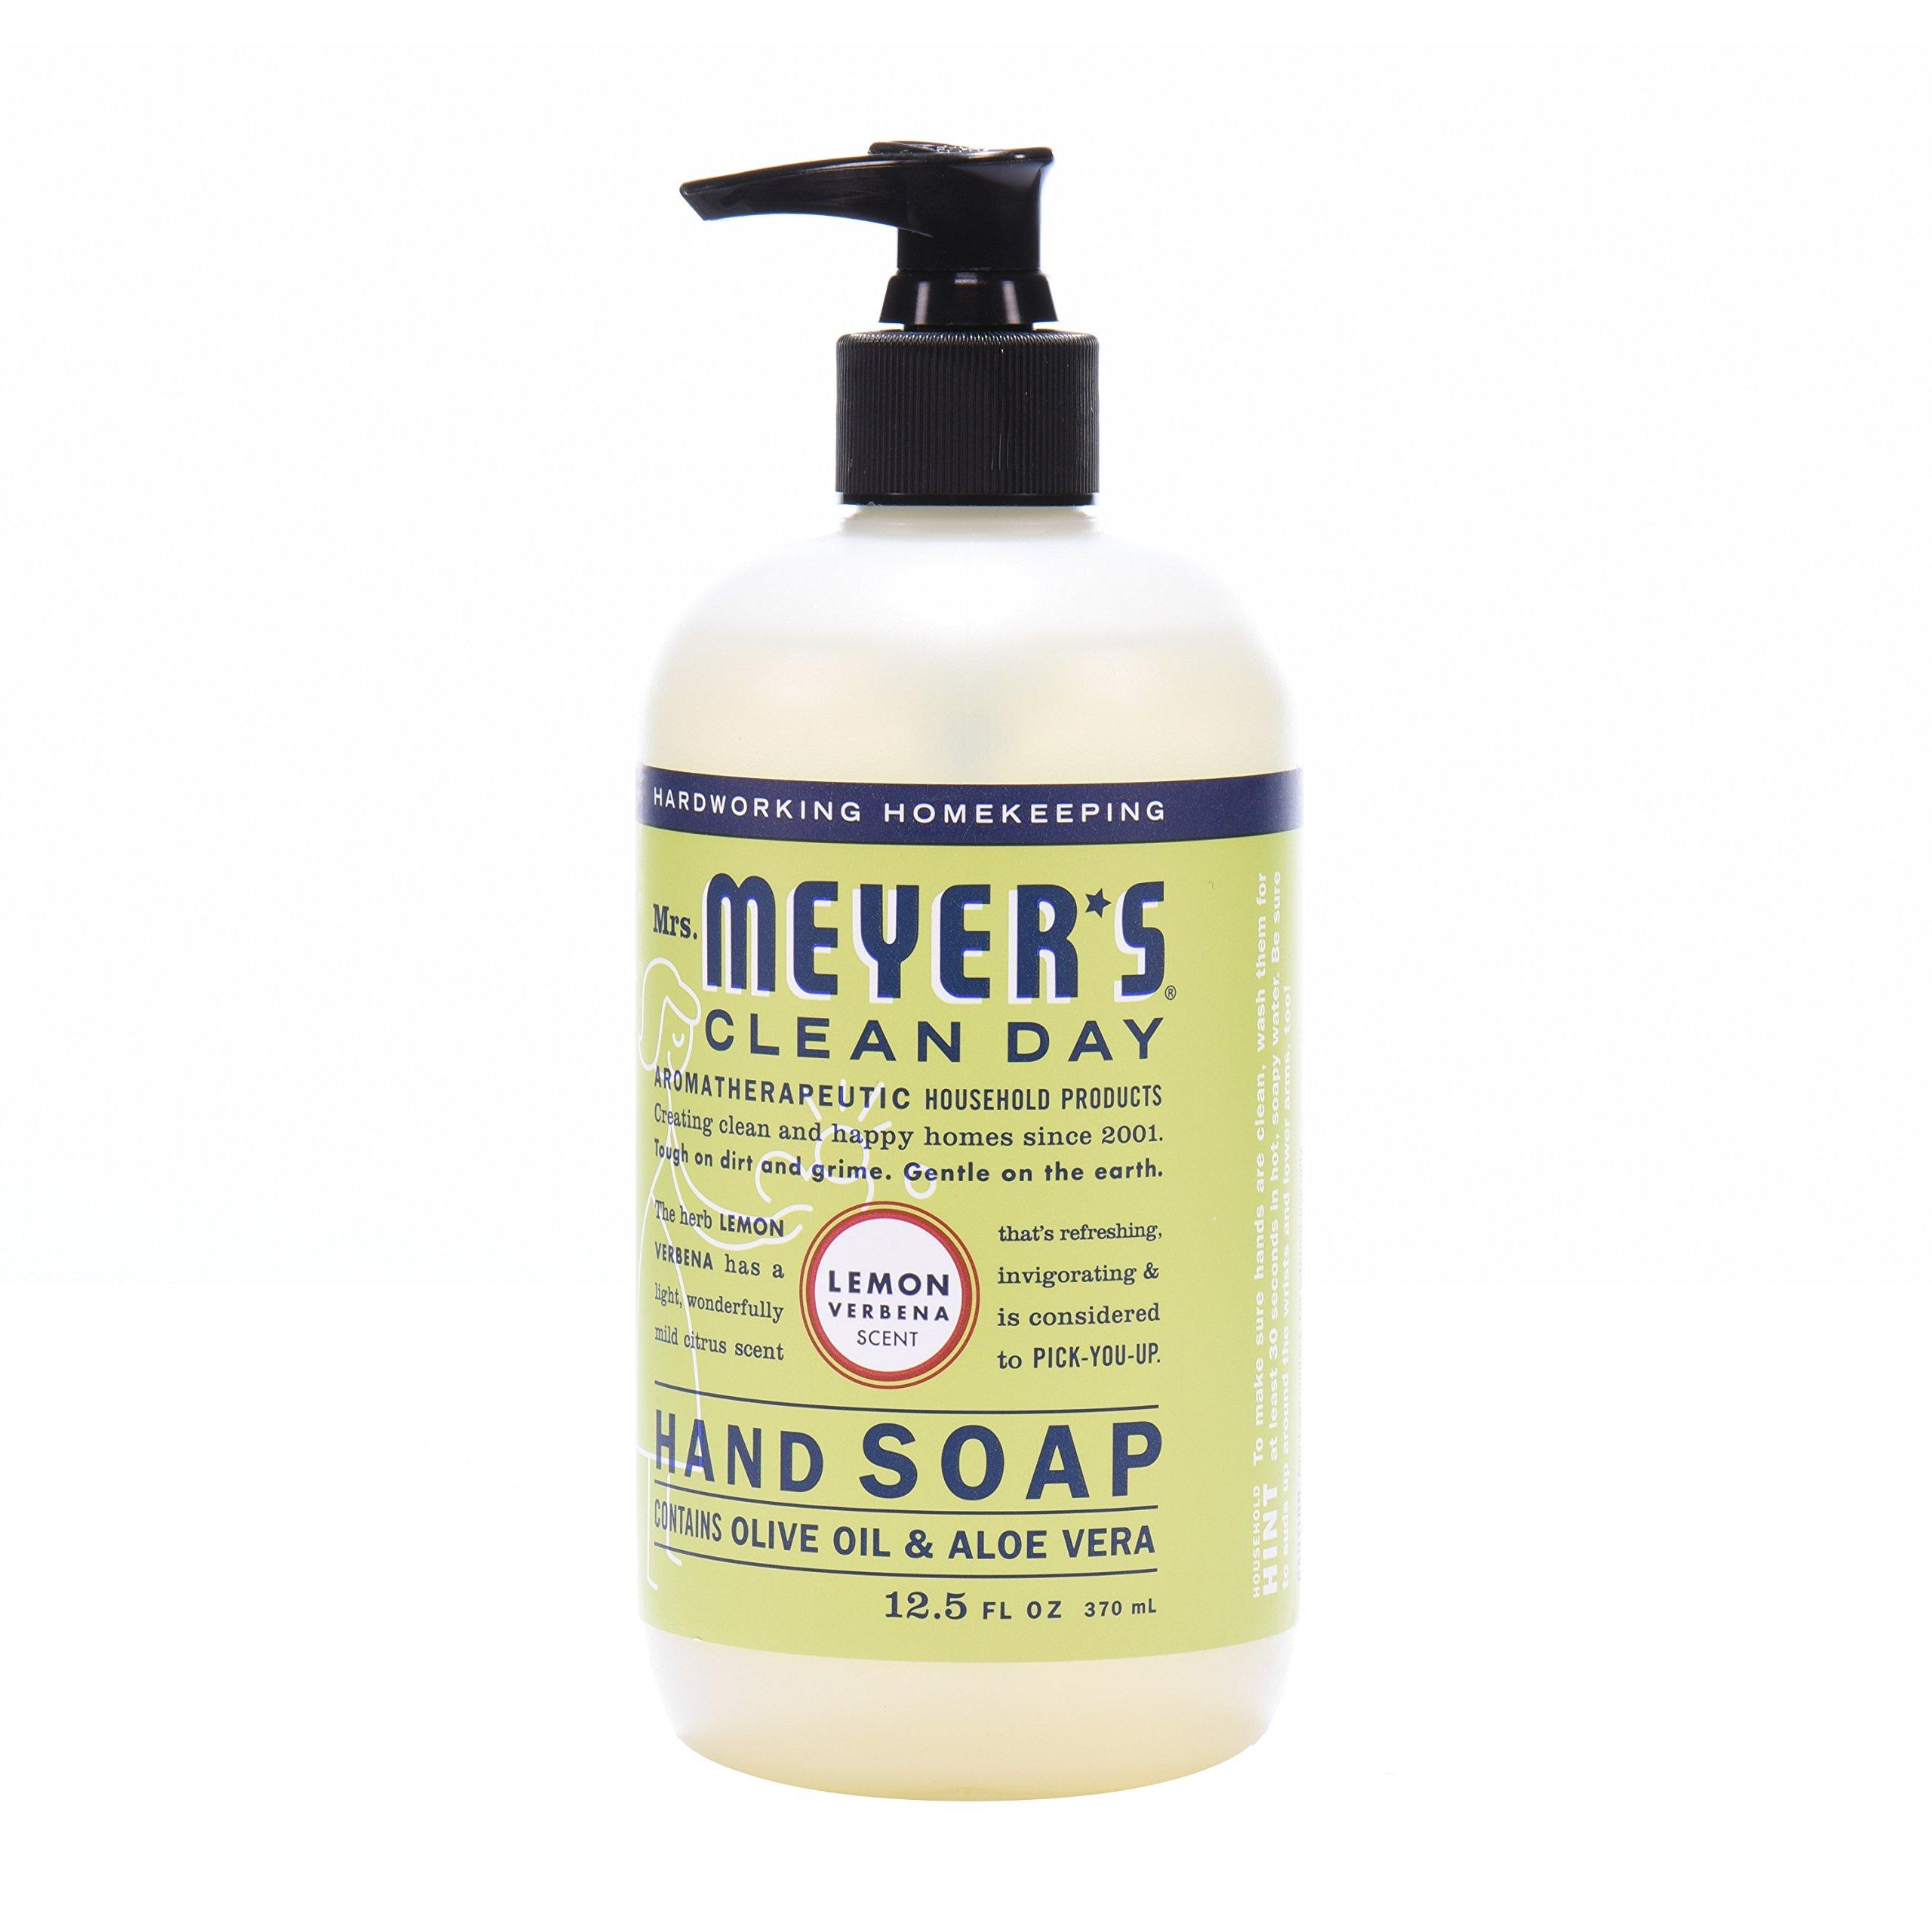 Mrs. Meyer´s Clean Day Hand Soap, Lemon Verbena, 12.5 fl oz, 3 ct by Mrs. Meyer's Clean Day (Image #3)